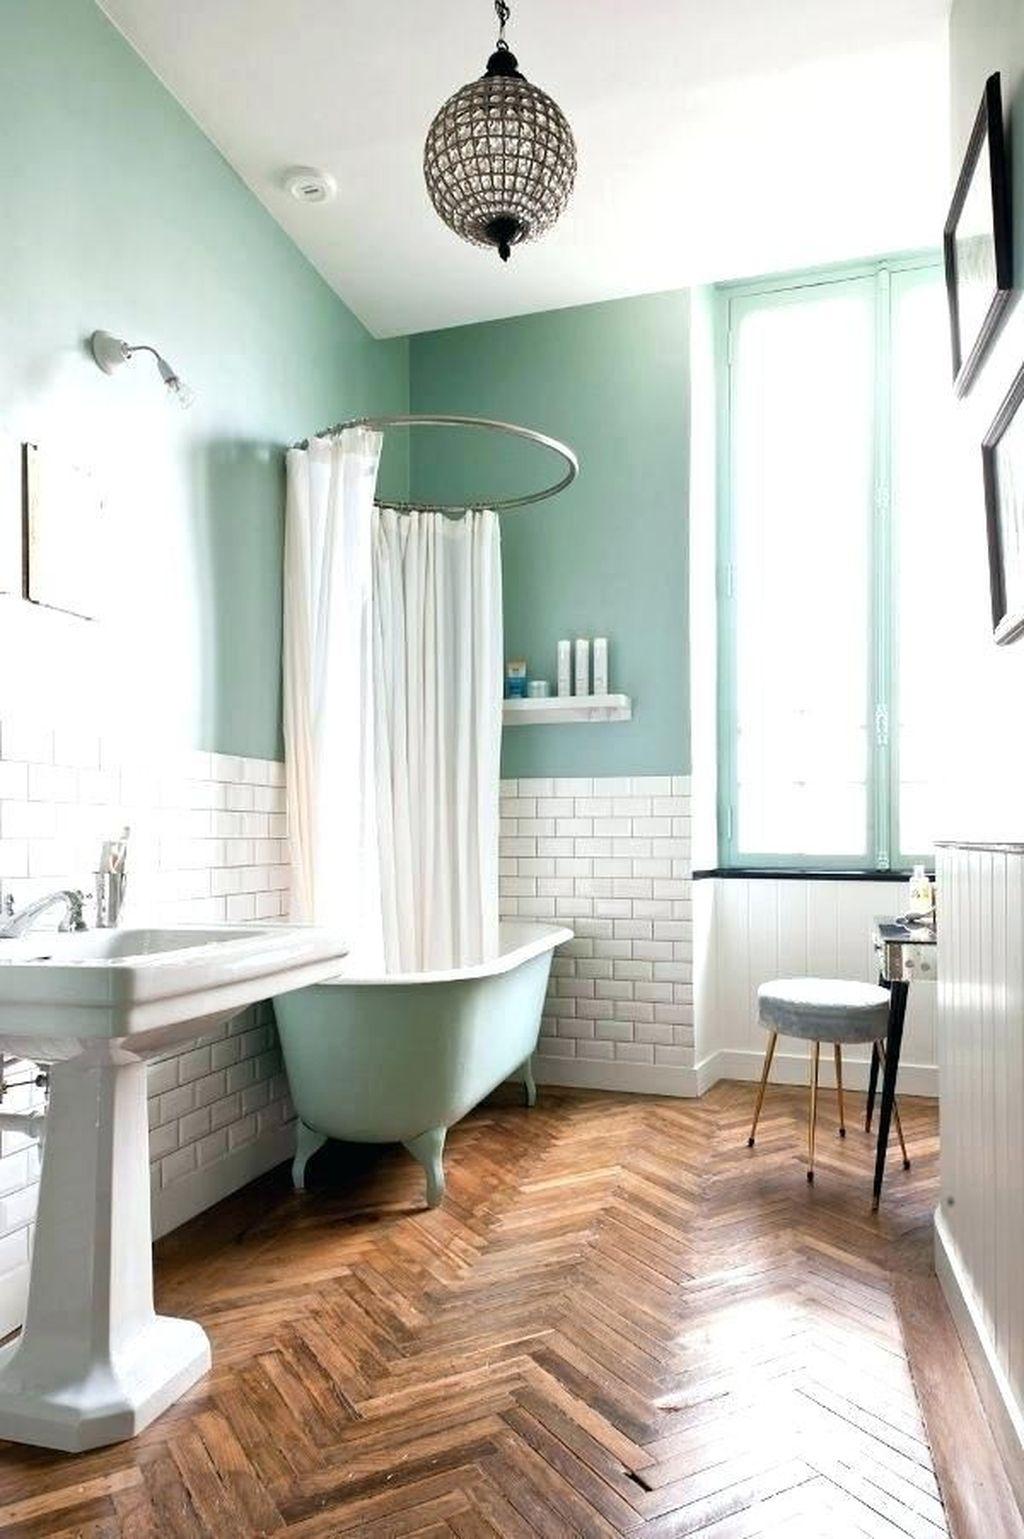 Marvelous Wooden Shower Floor Tiles Designs Ideas For Bathroom Remodel 04